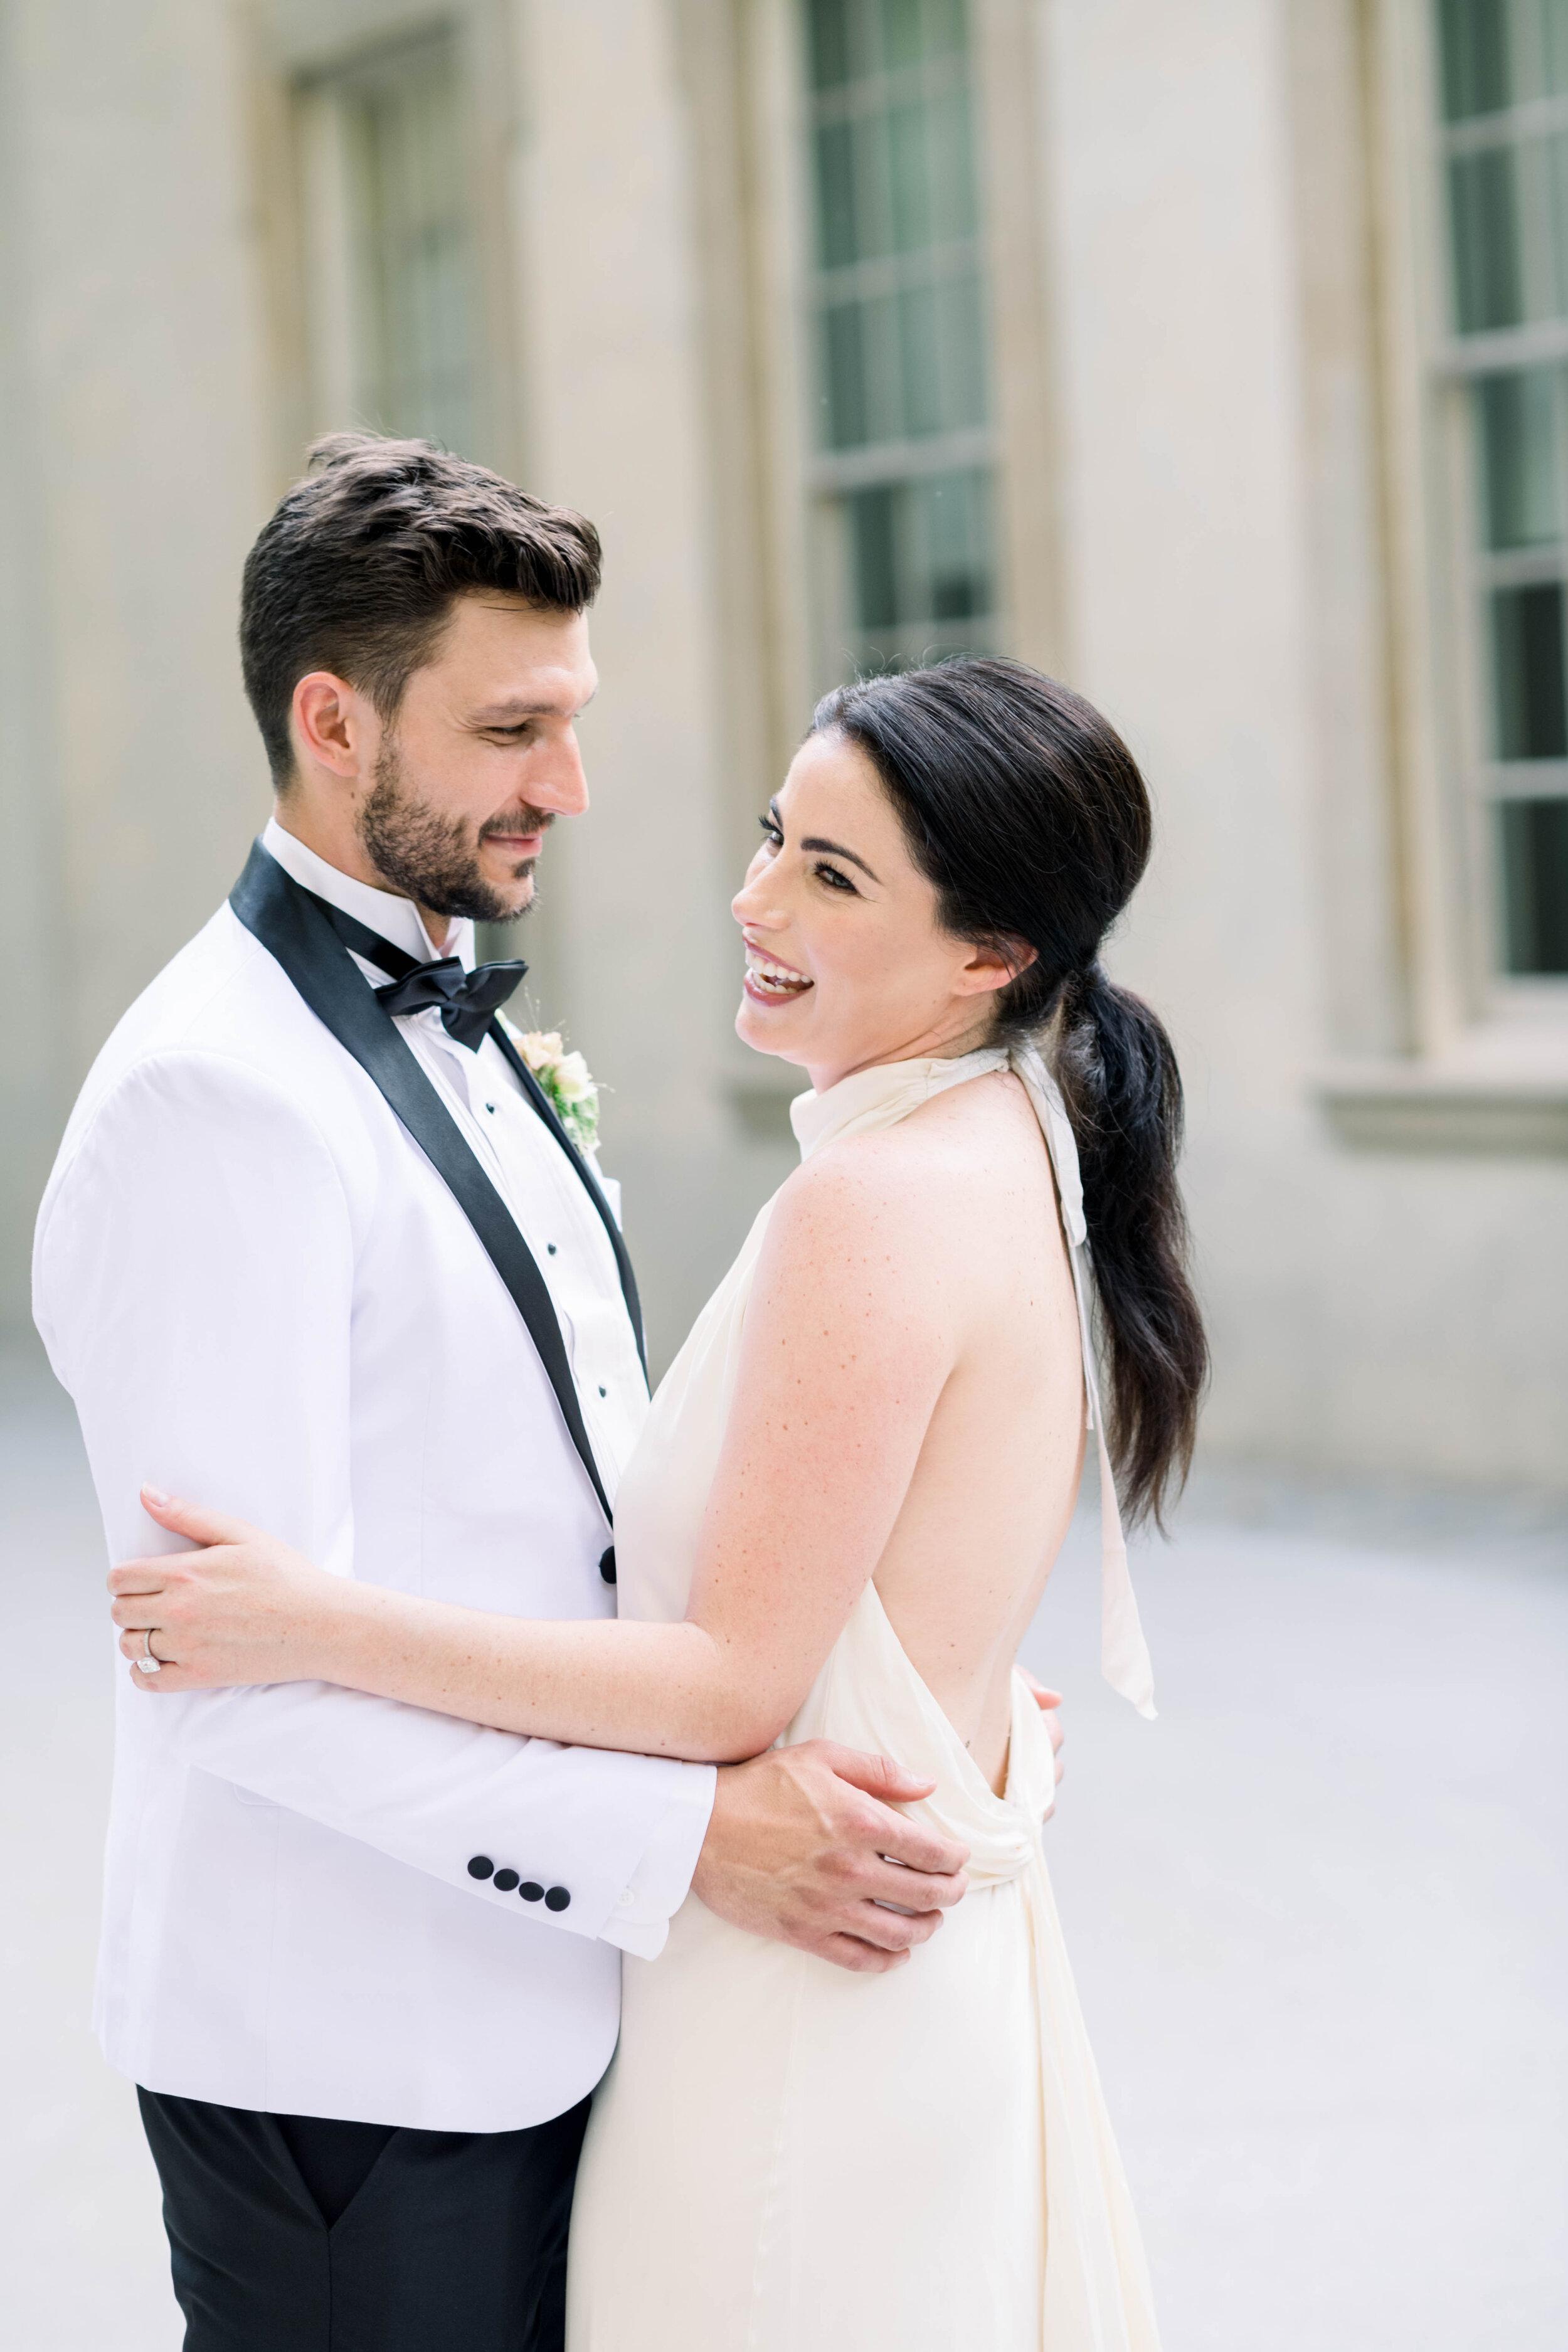 fine art wedding, Atlanta wedding, swan house wedding, modern wedding, rolls Royce wedding, swan house, high neck wedding dress, white tux, wedding dance